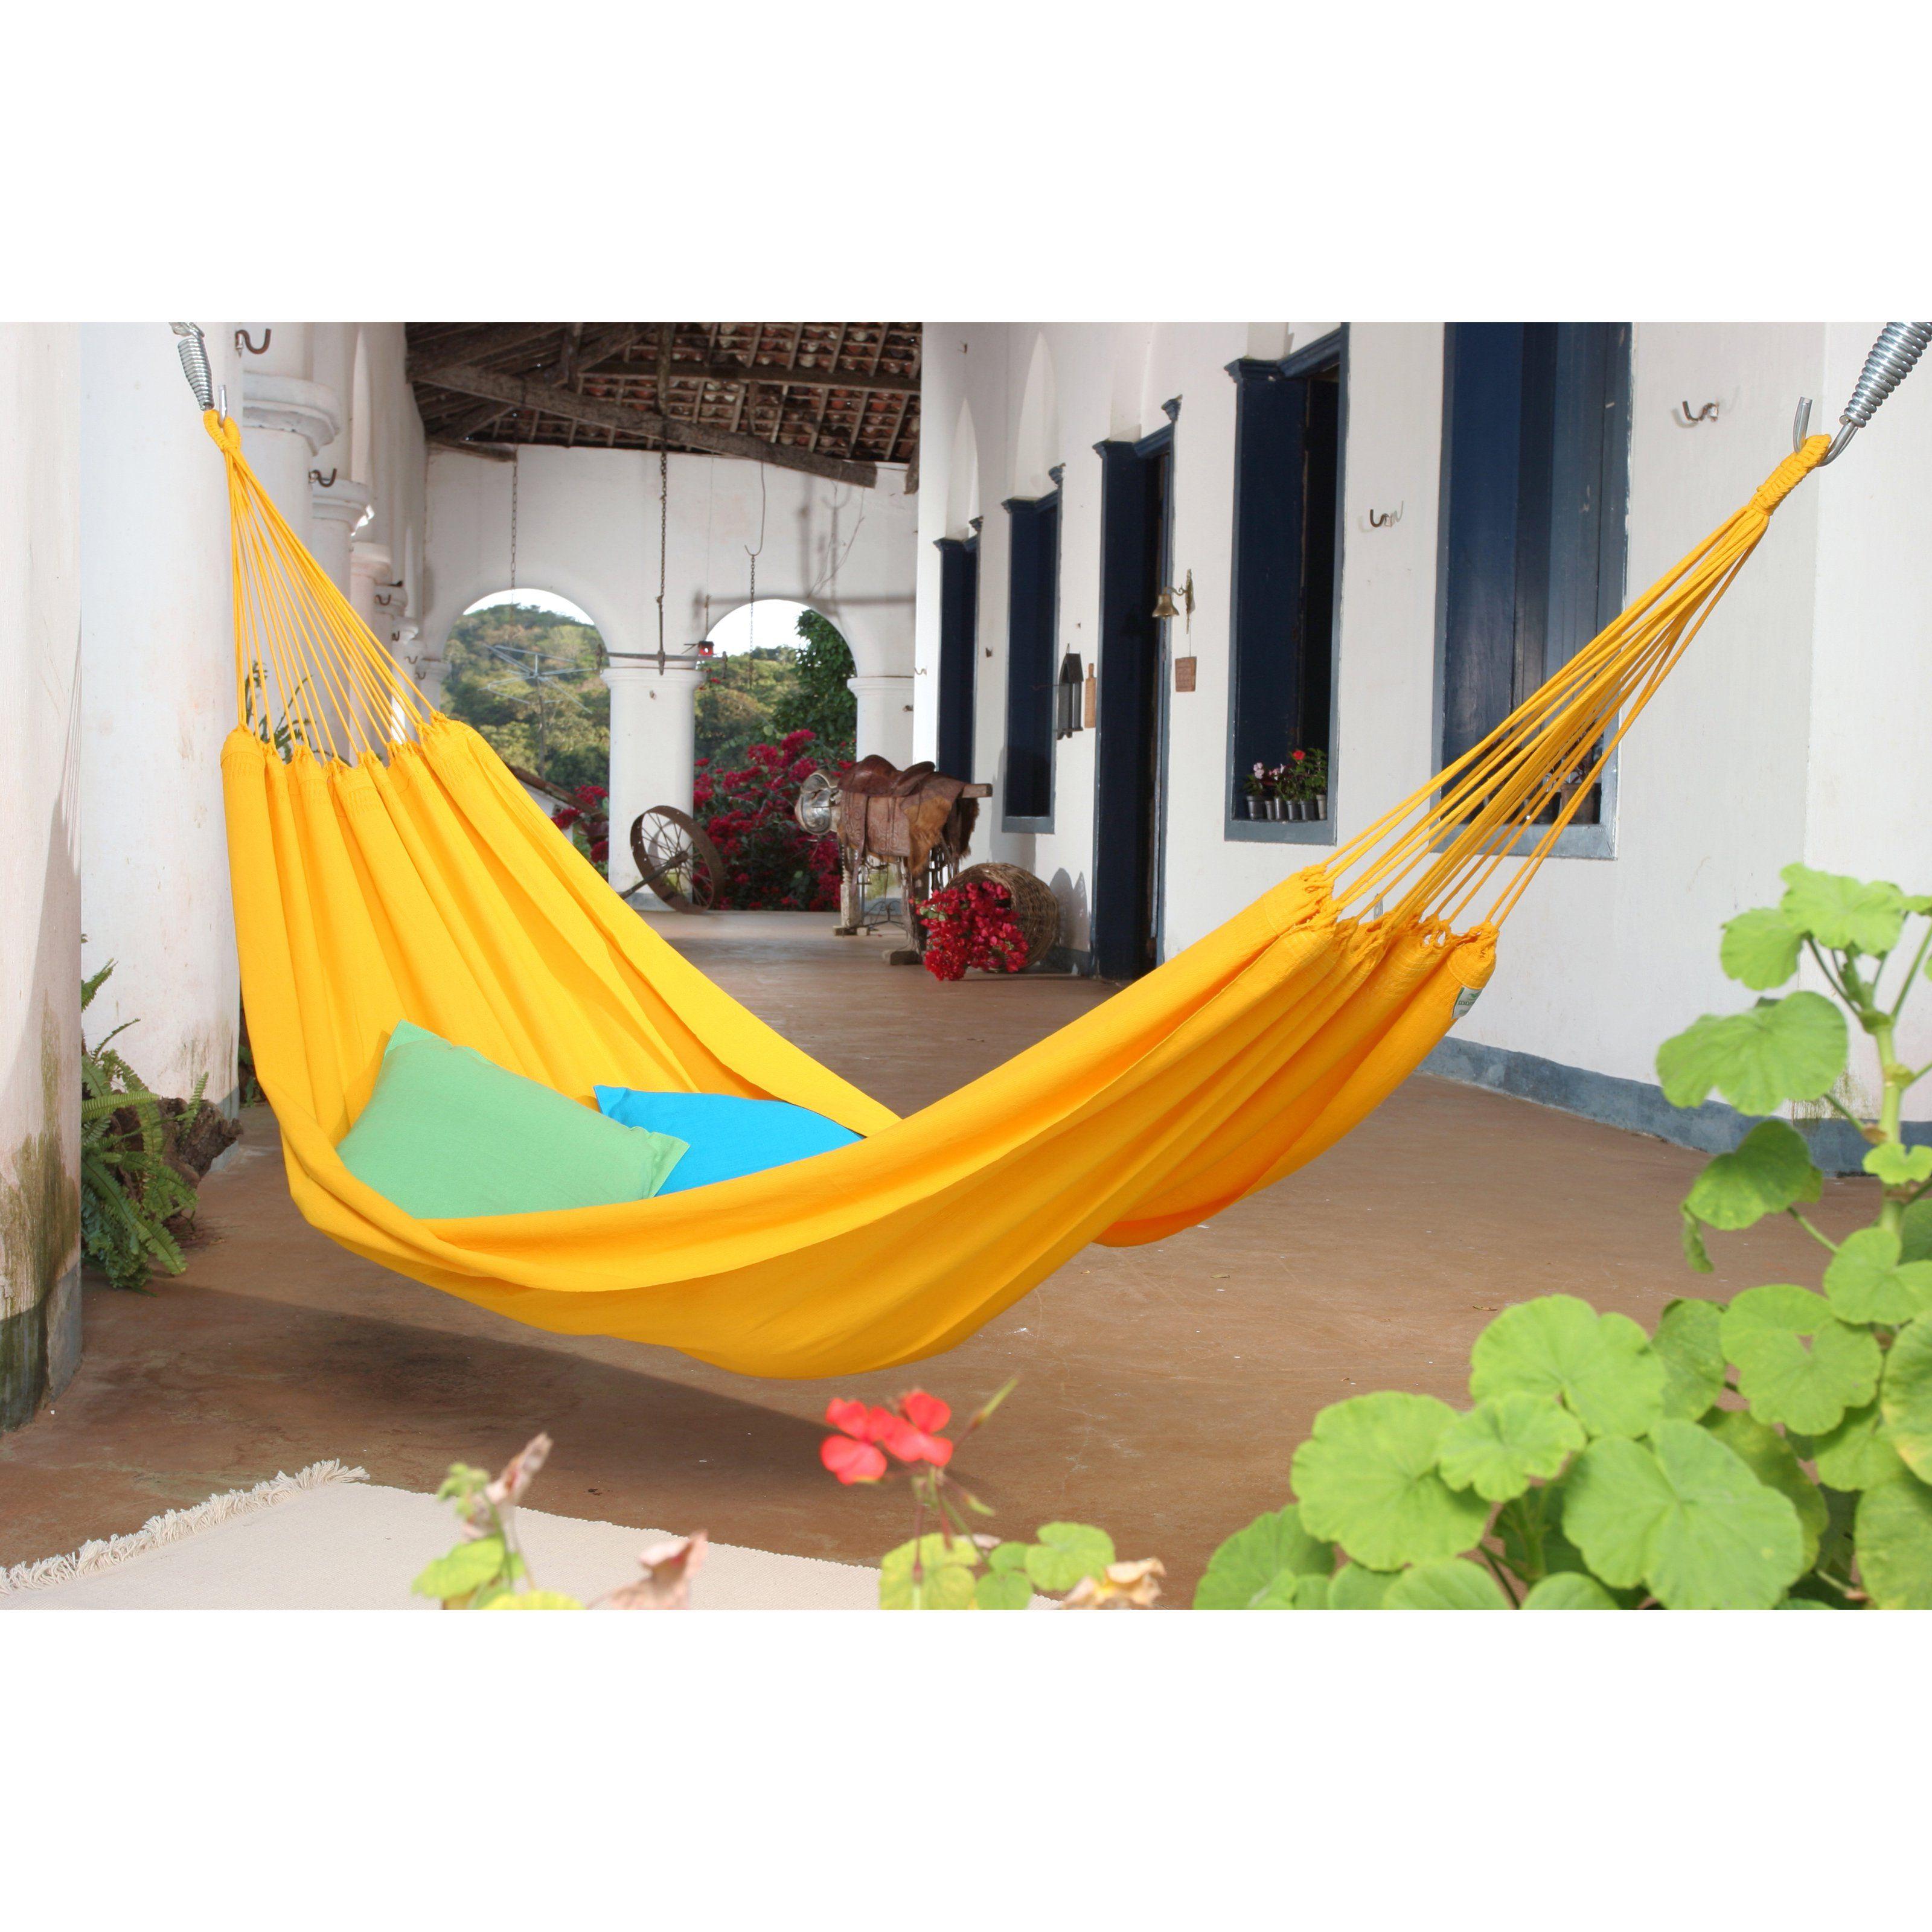 island bay small traditional hand woven brazilian solid colored hammock   outdoor hammocks at hayneedle island bay small traditional hand woven brazilian solid colored      rh   pinterest